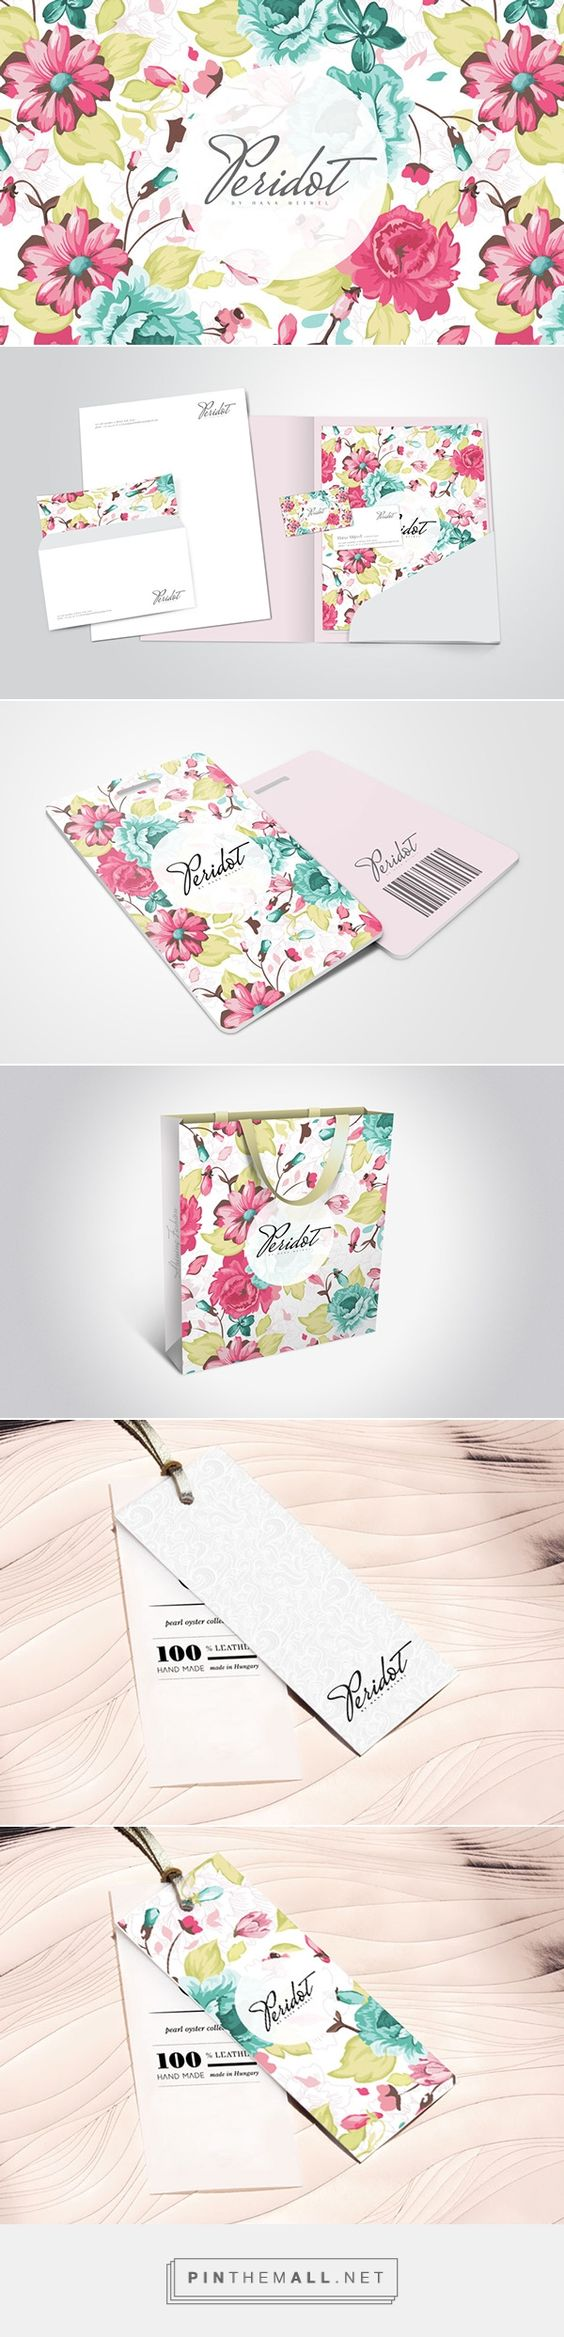 Peridot | Cloth Brand Italy on Behance | Fivestar Branding – Design and Branding Agency & Inspiration Gallery